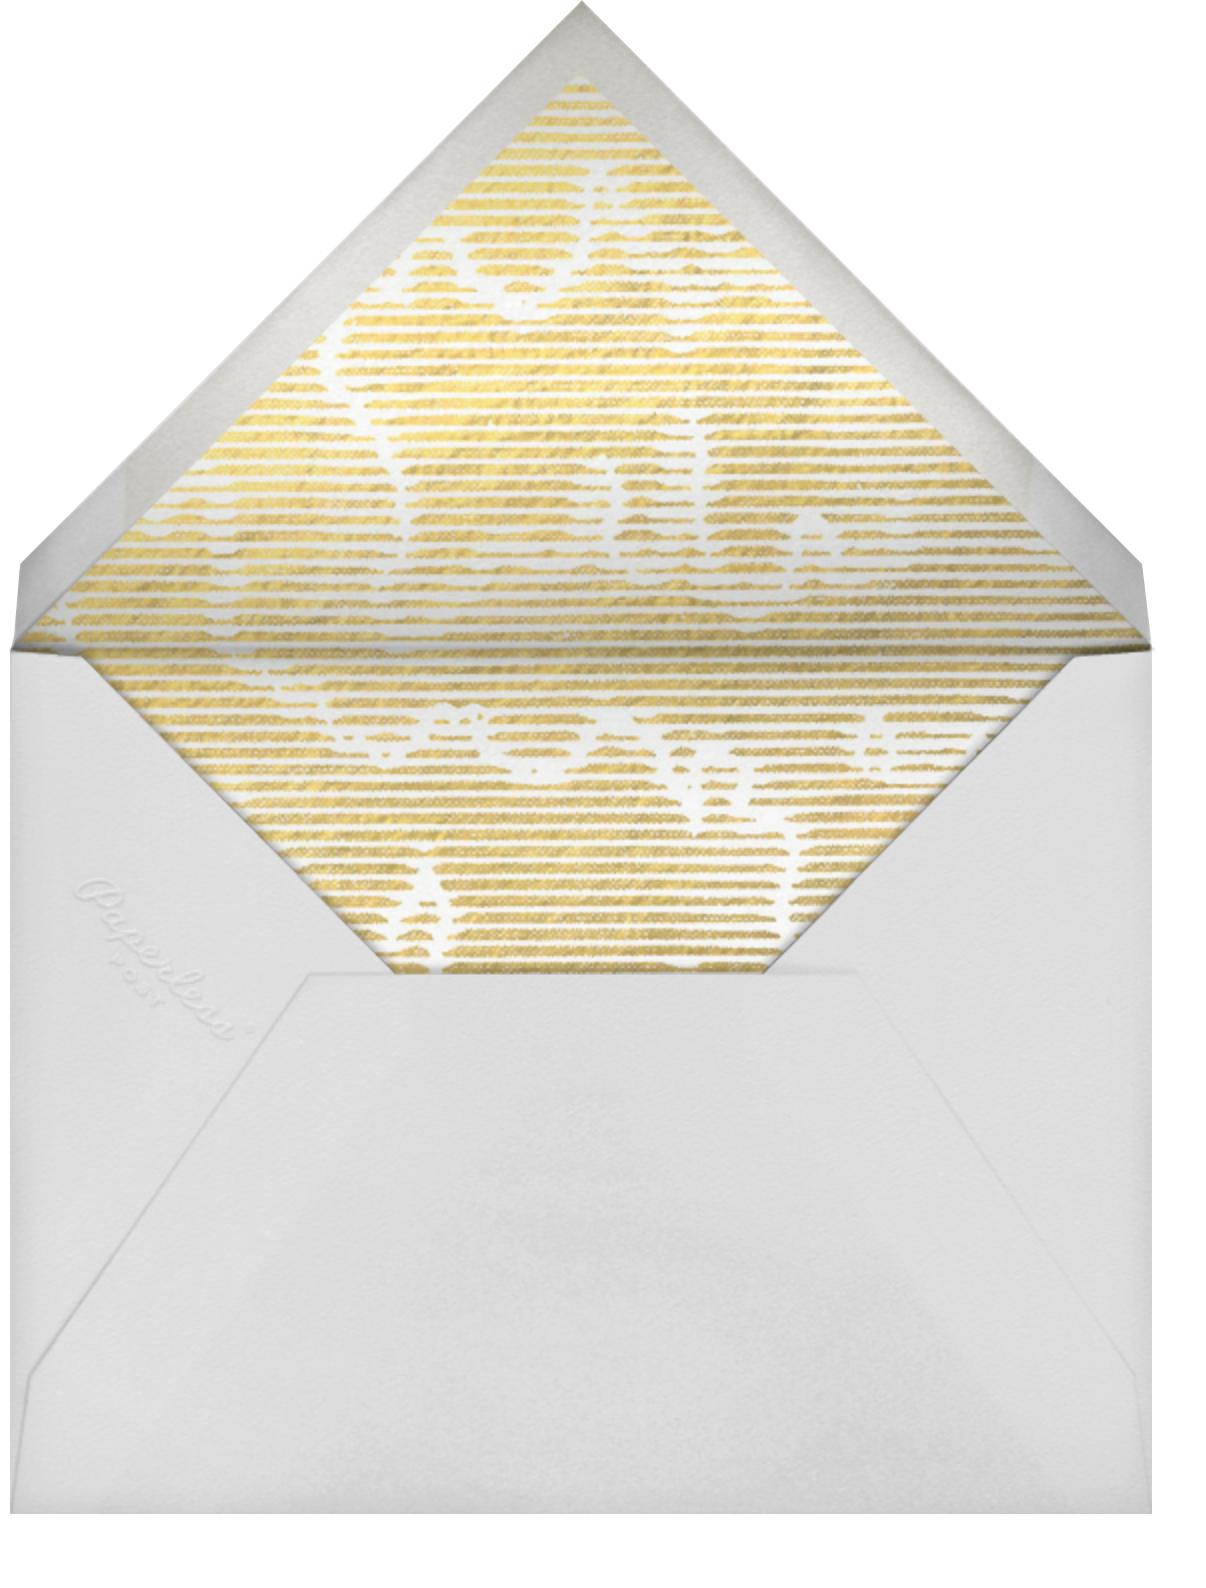 Acclaim - Kelly Wearstler - Bachelorette party - envelope back